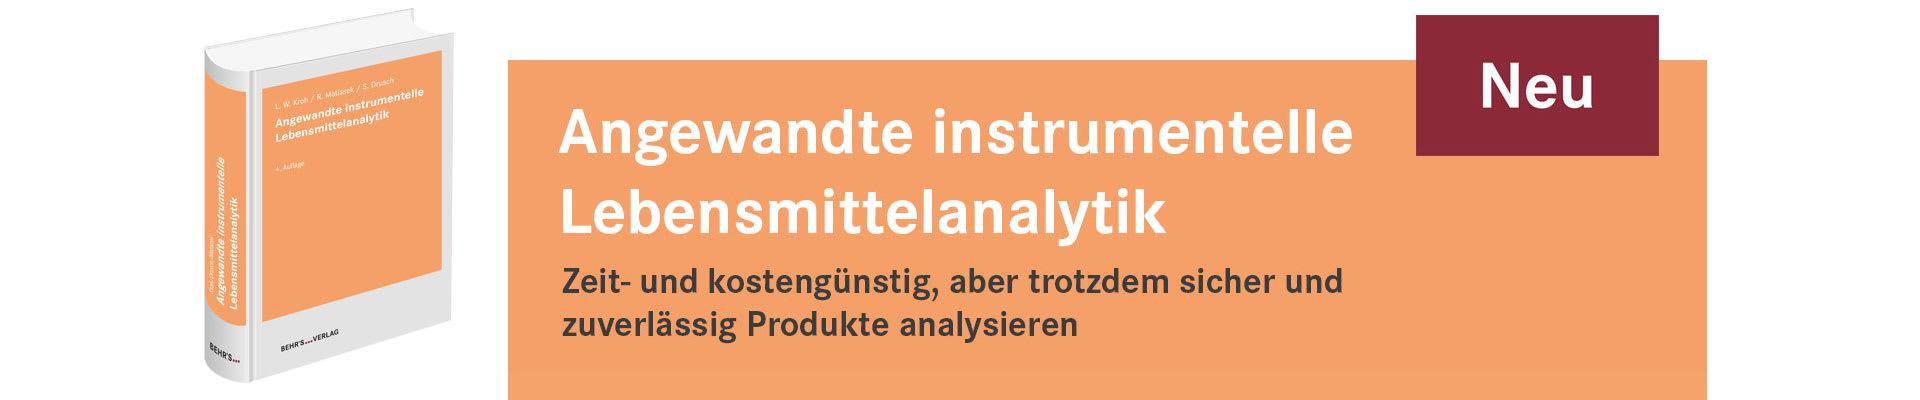 Angewandte instrumentelle Lebensmittelanalytik